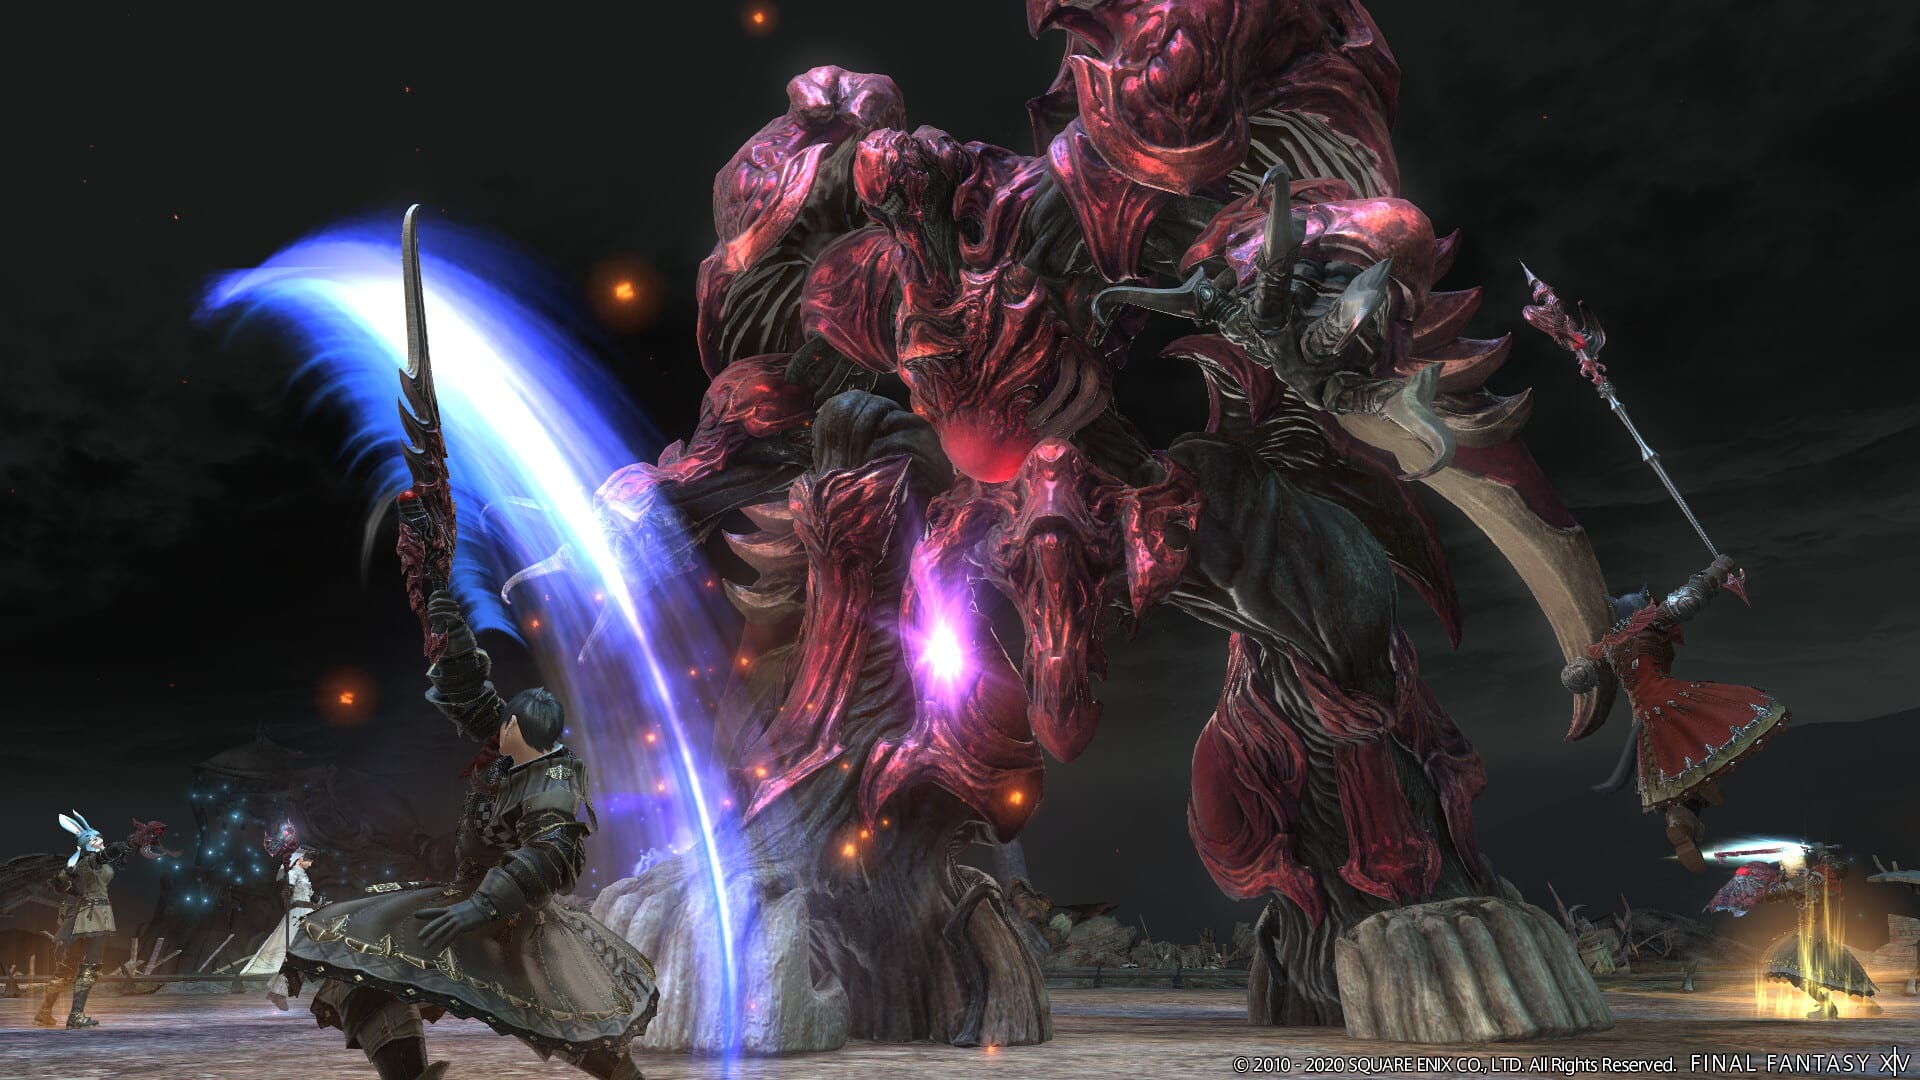 ffxiv, ruby weapon